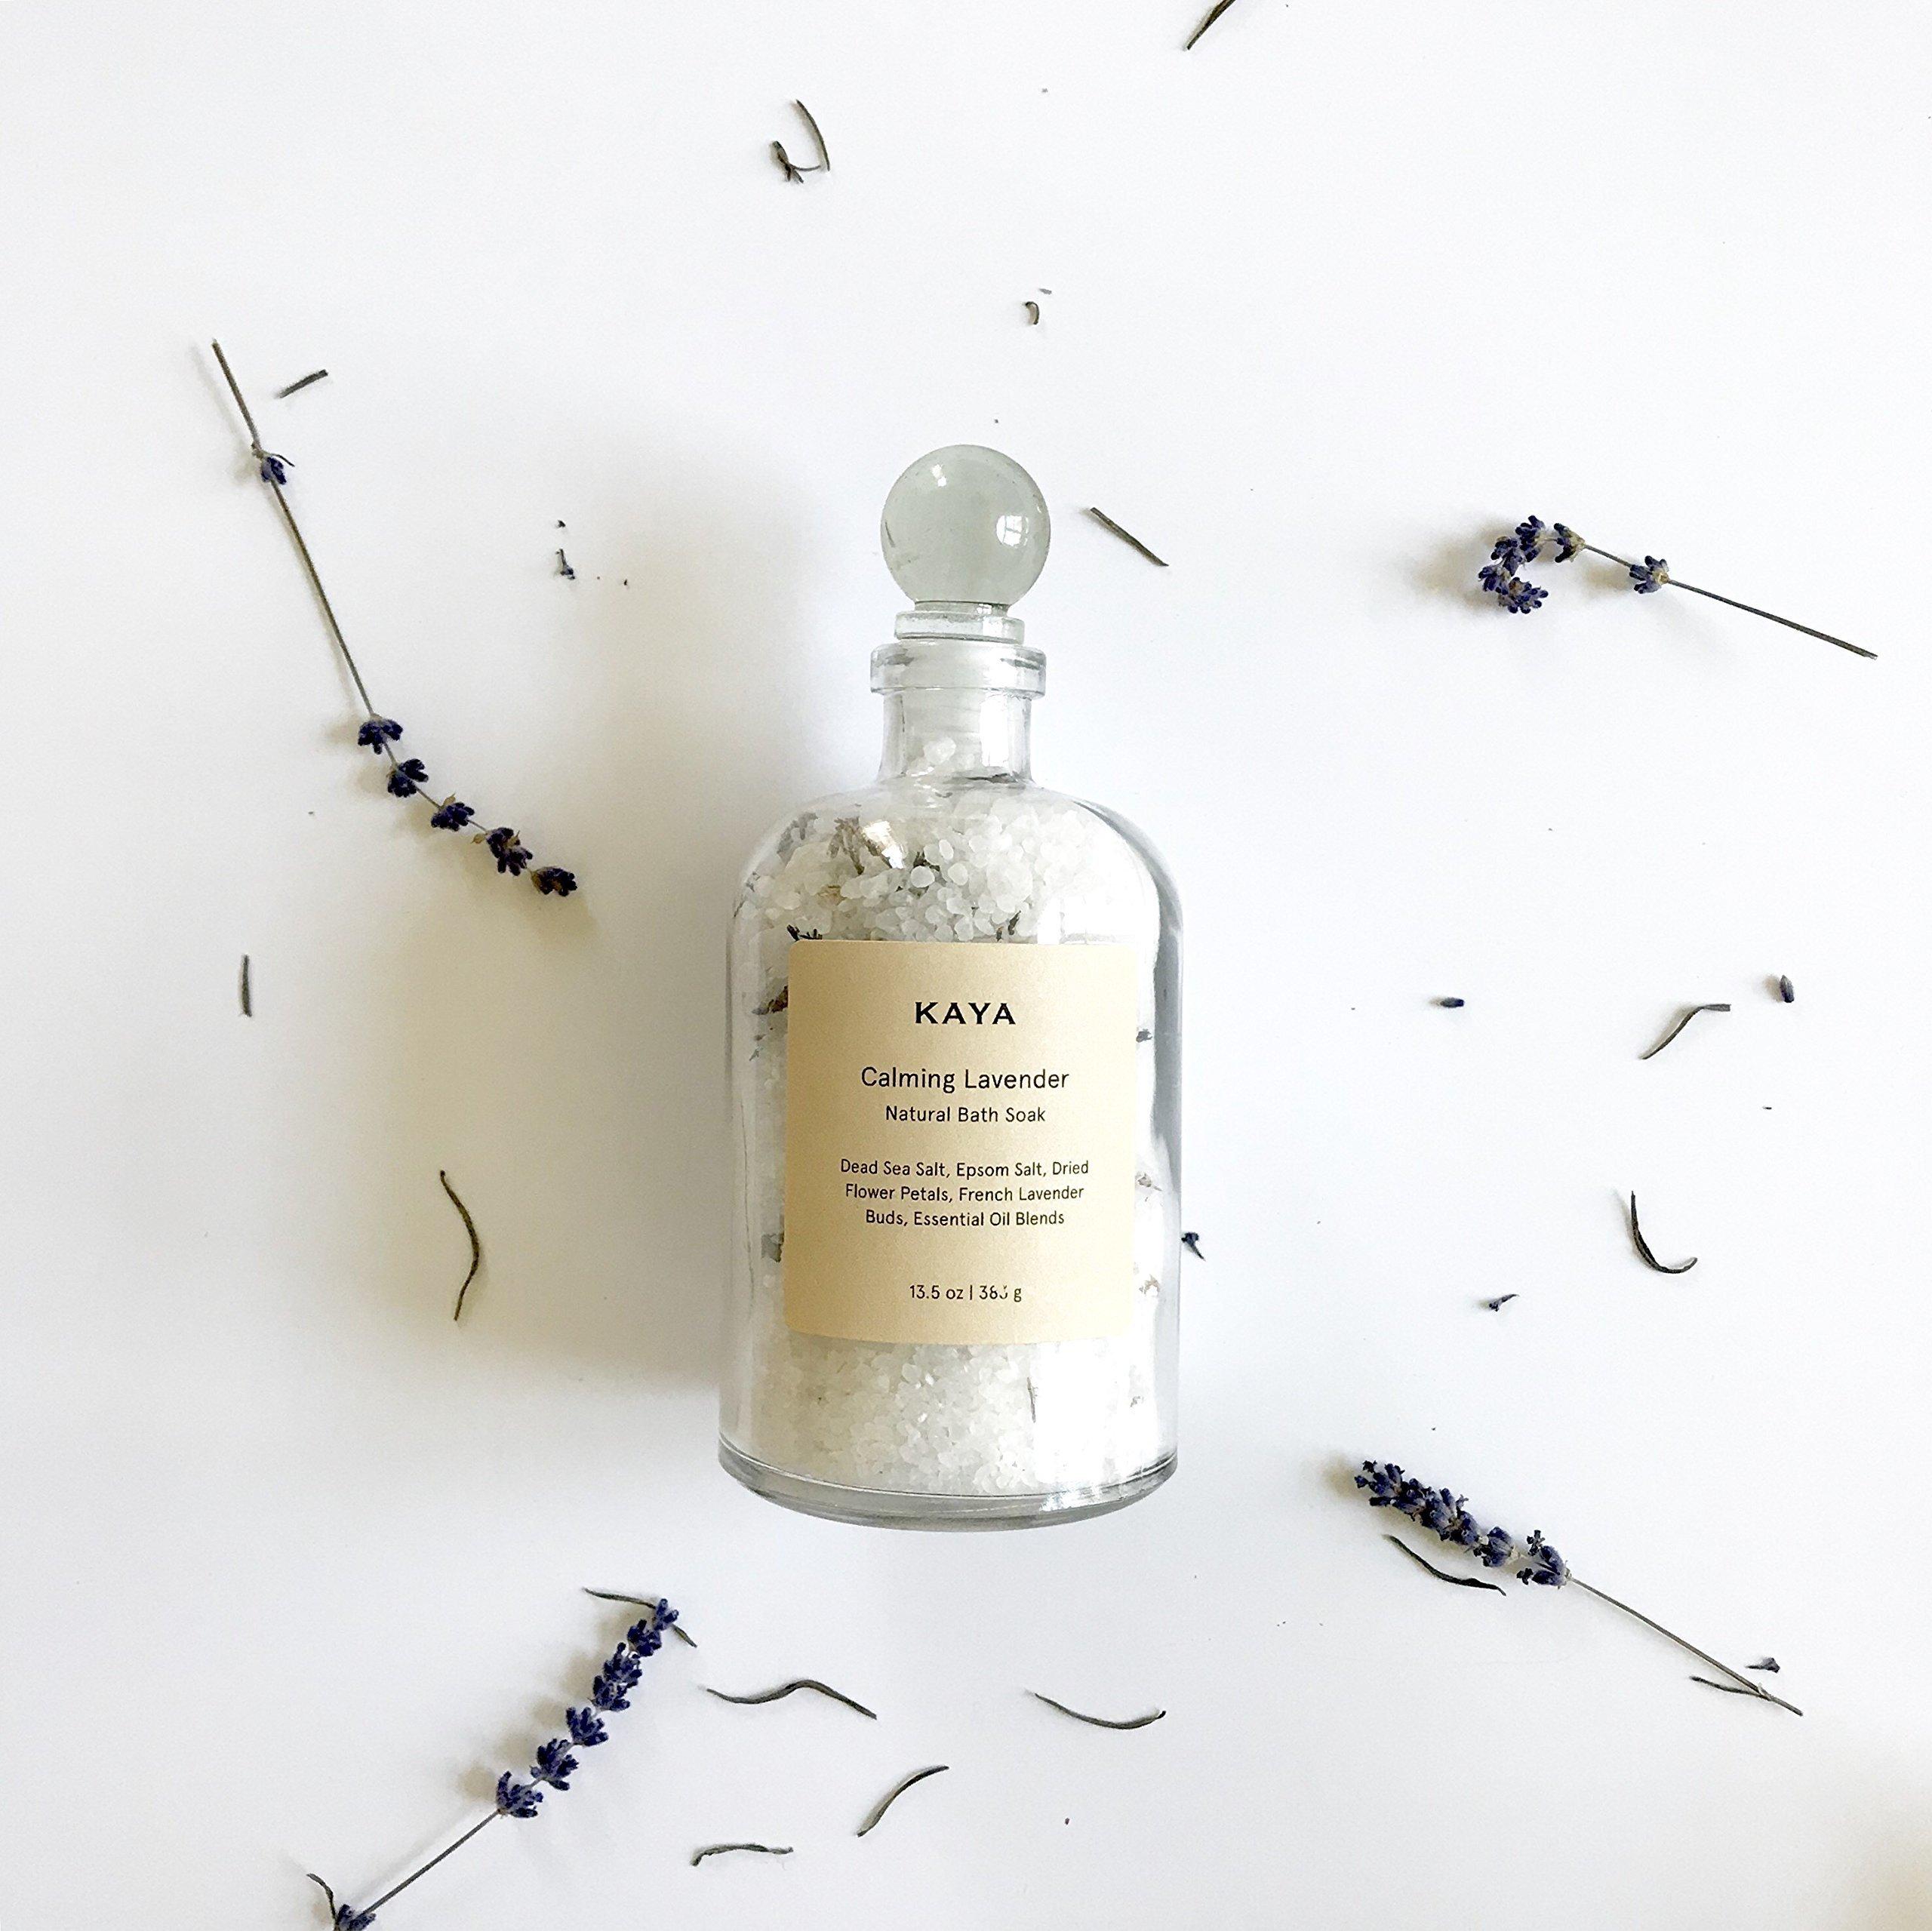 Kaya Lavender Bath Salts | All Natural Bath Soak 13.5 oz by KayaSoaps